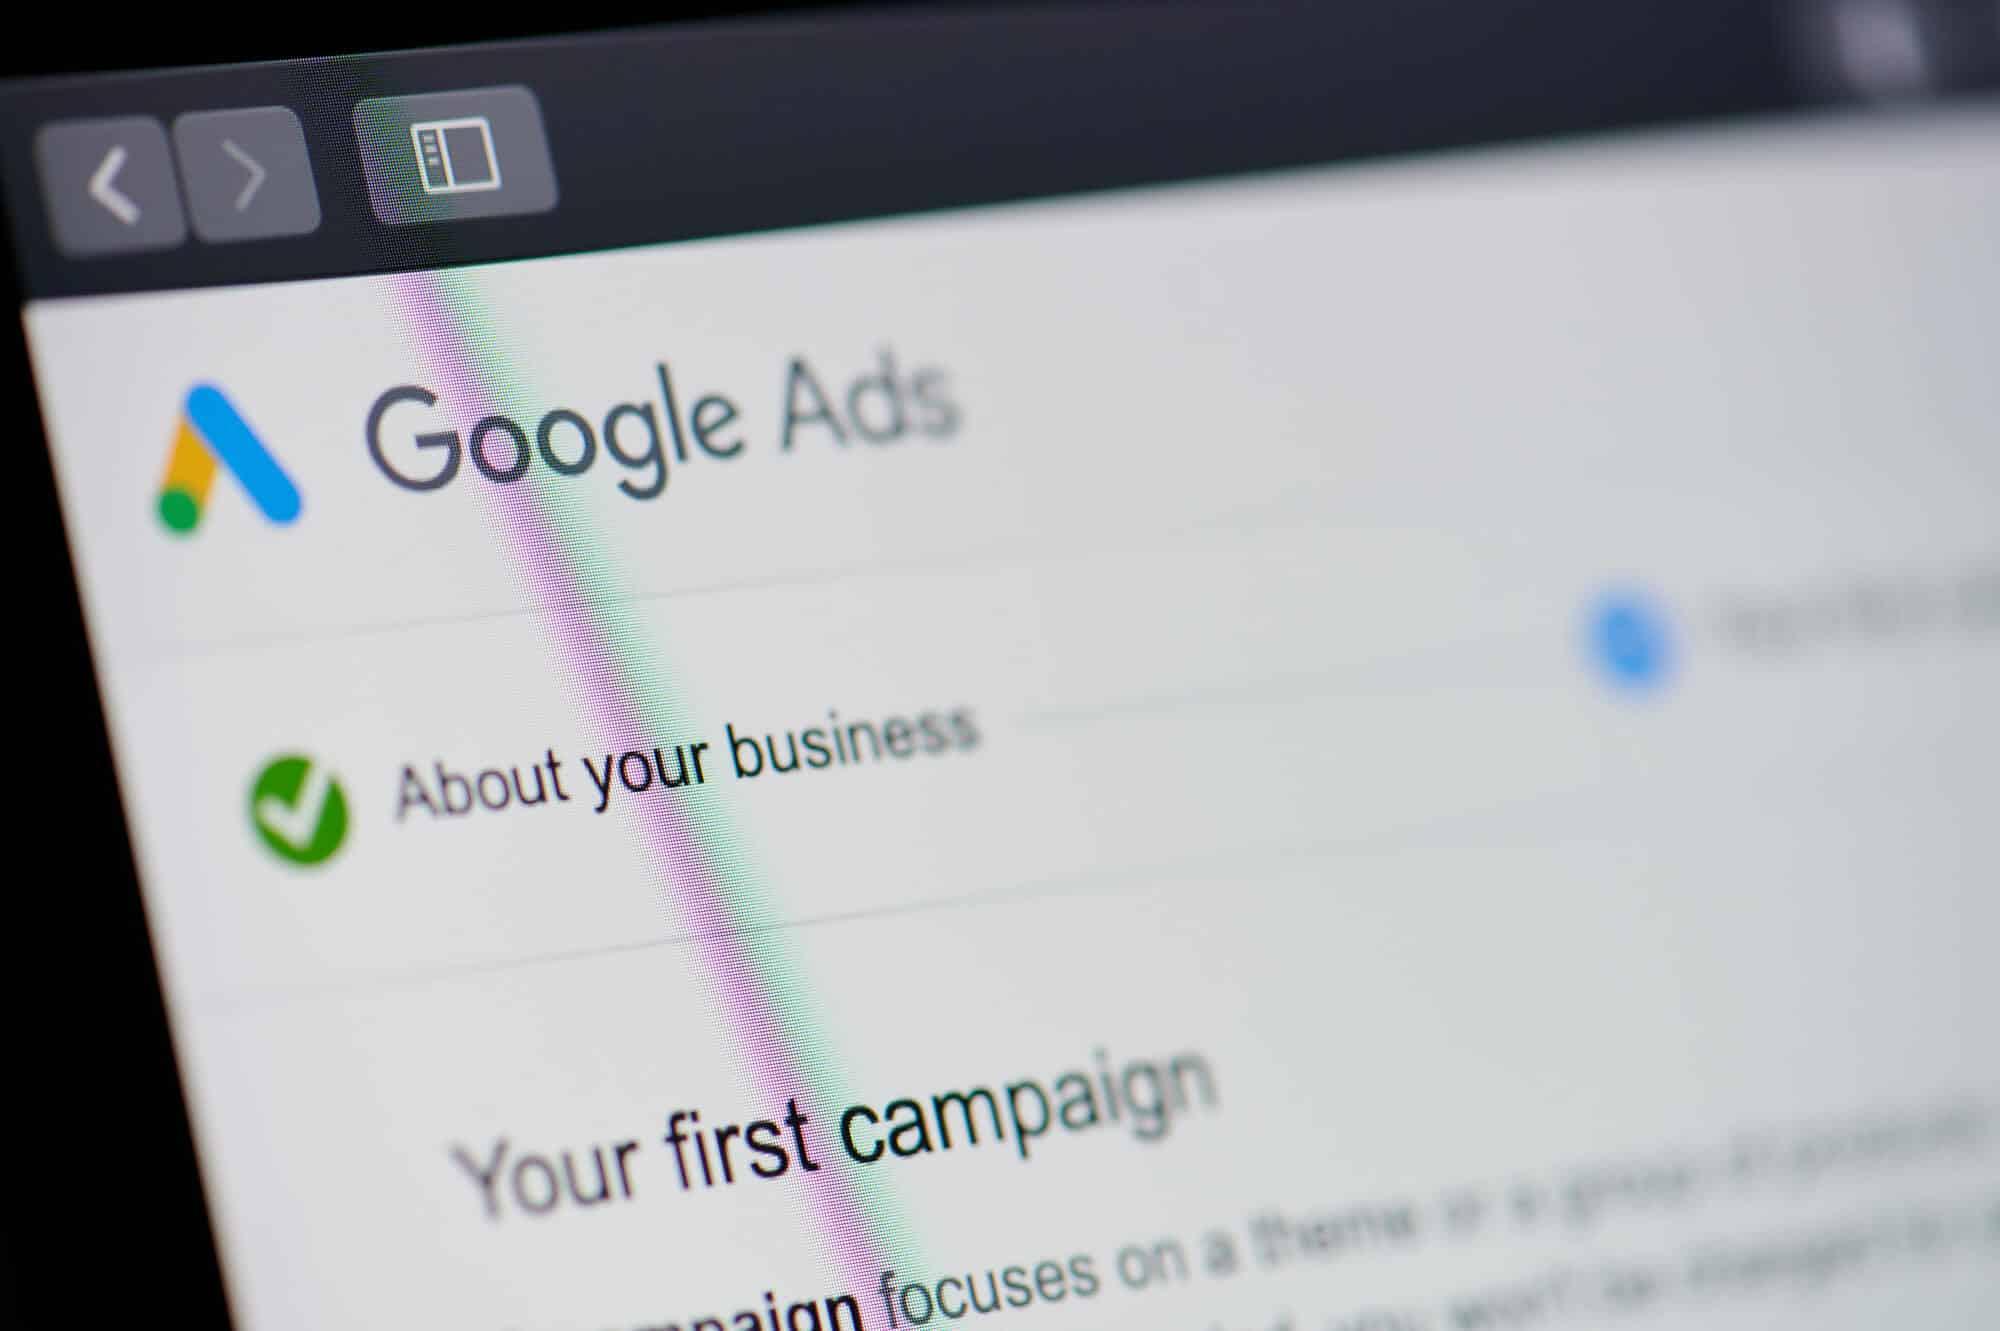 Big Easy SEO - Google Ads Marketing Strategies